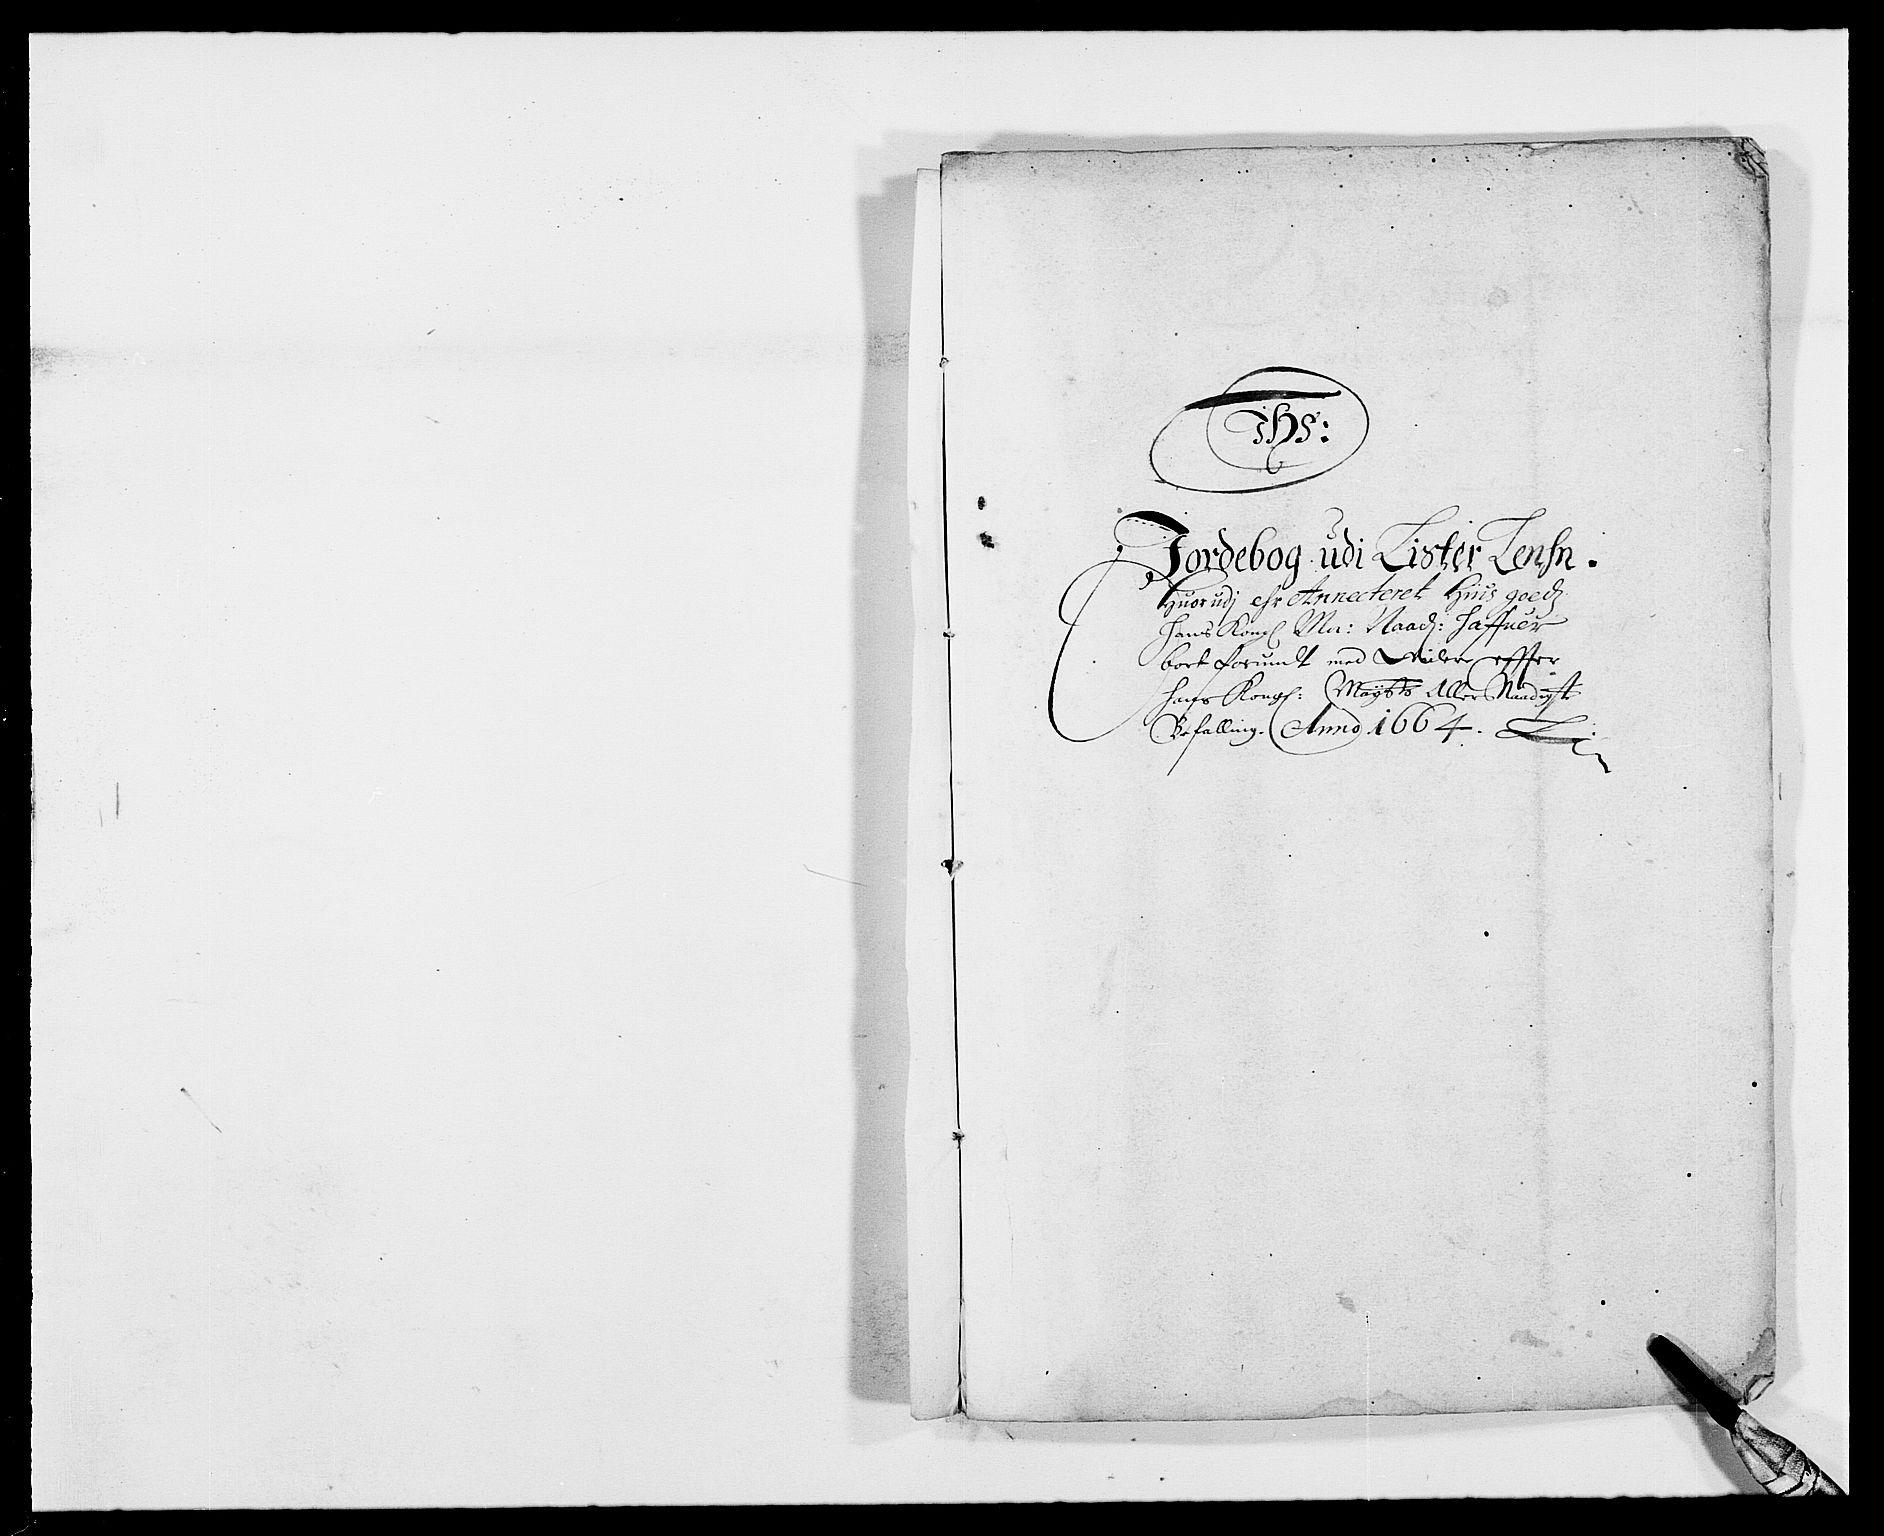 RA, Rentekammeret inntil 1814, Reviderte regnskaper, Fogderegnskap, R41/L2523: Fogderegnskap Lista, 1663-1664, s. 344